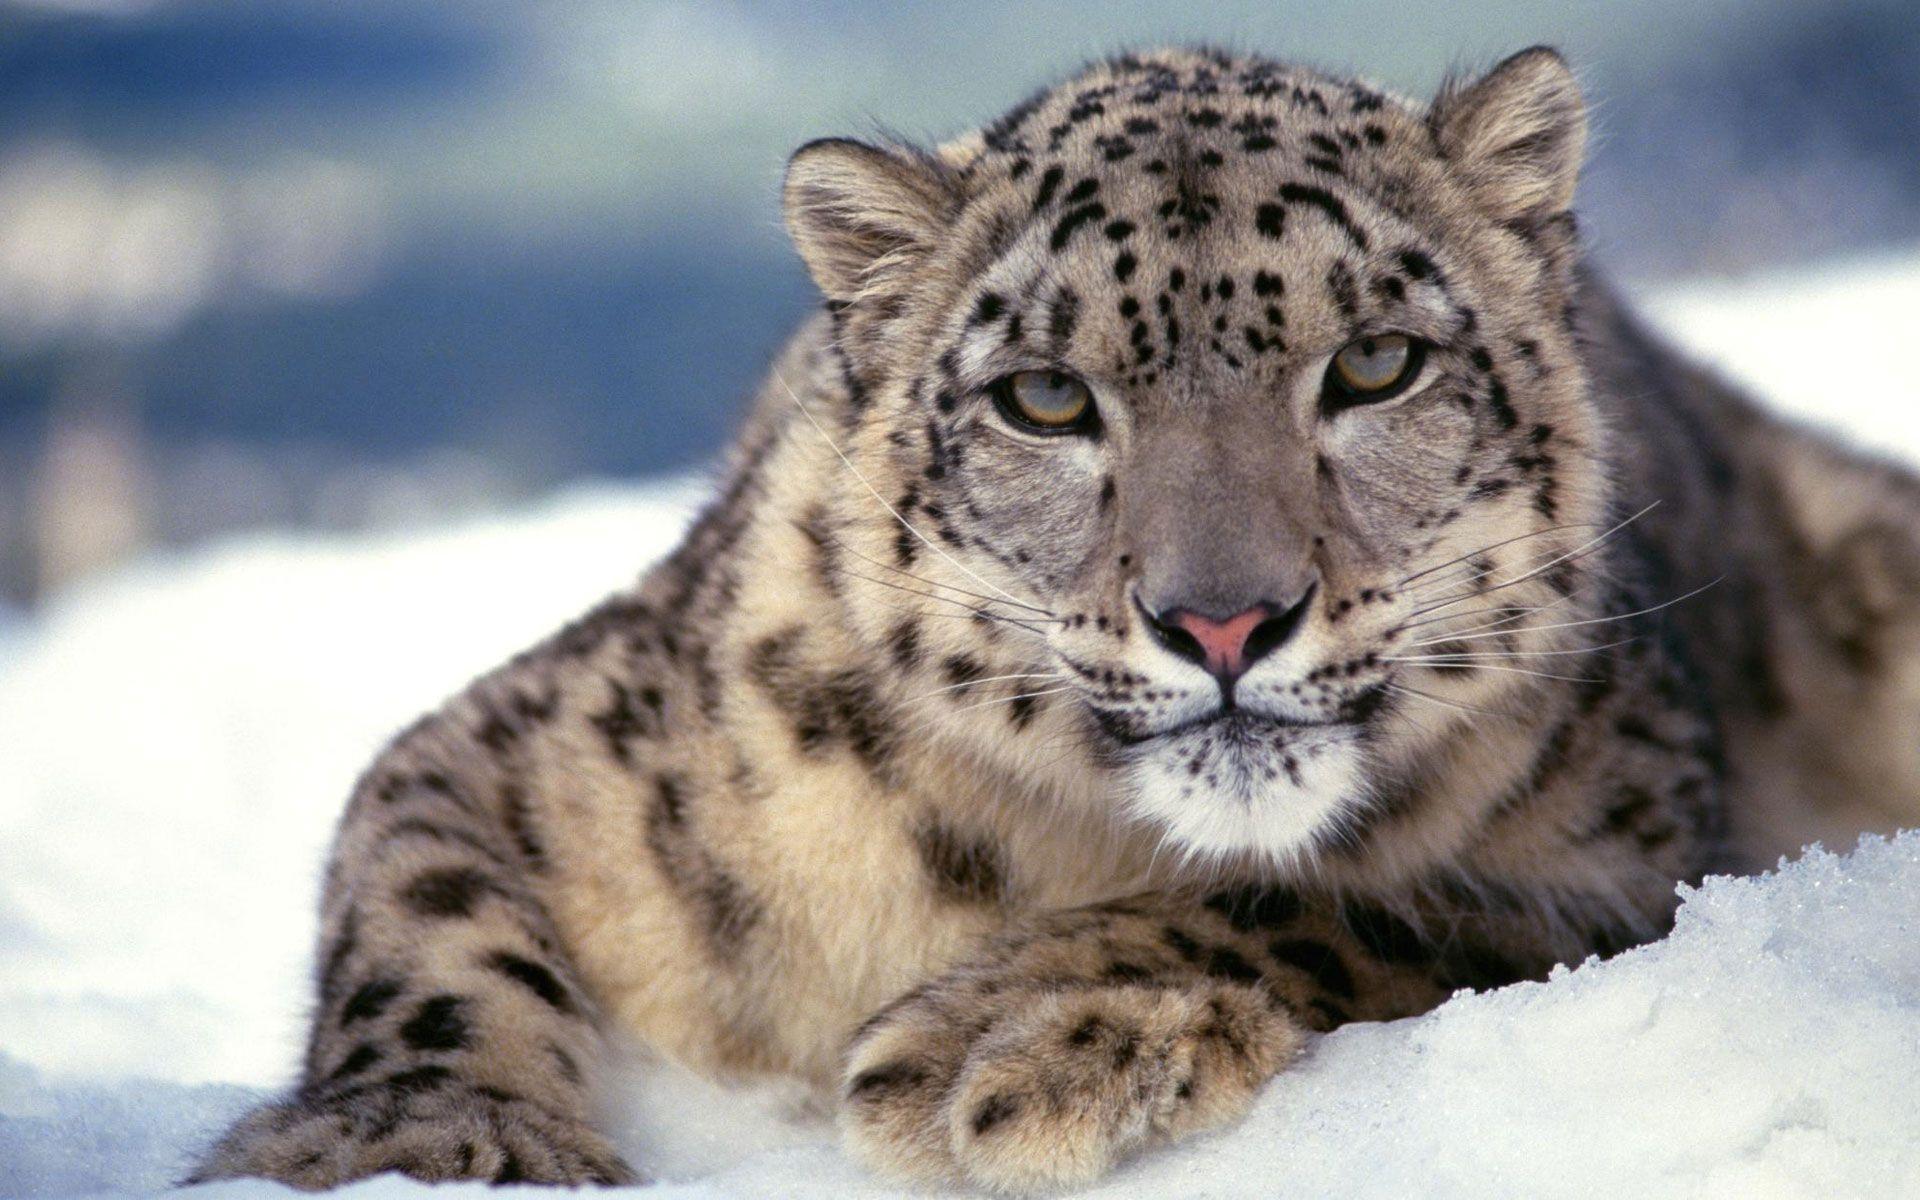 1920x1080 Wallpapers Os X Snow Leopard Horizon Resolution